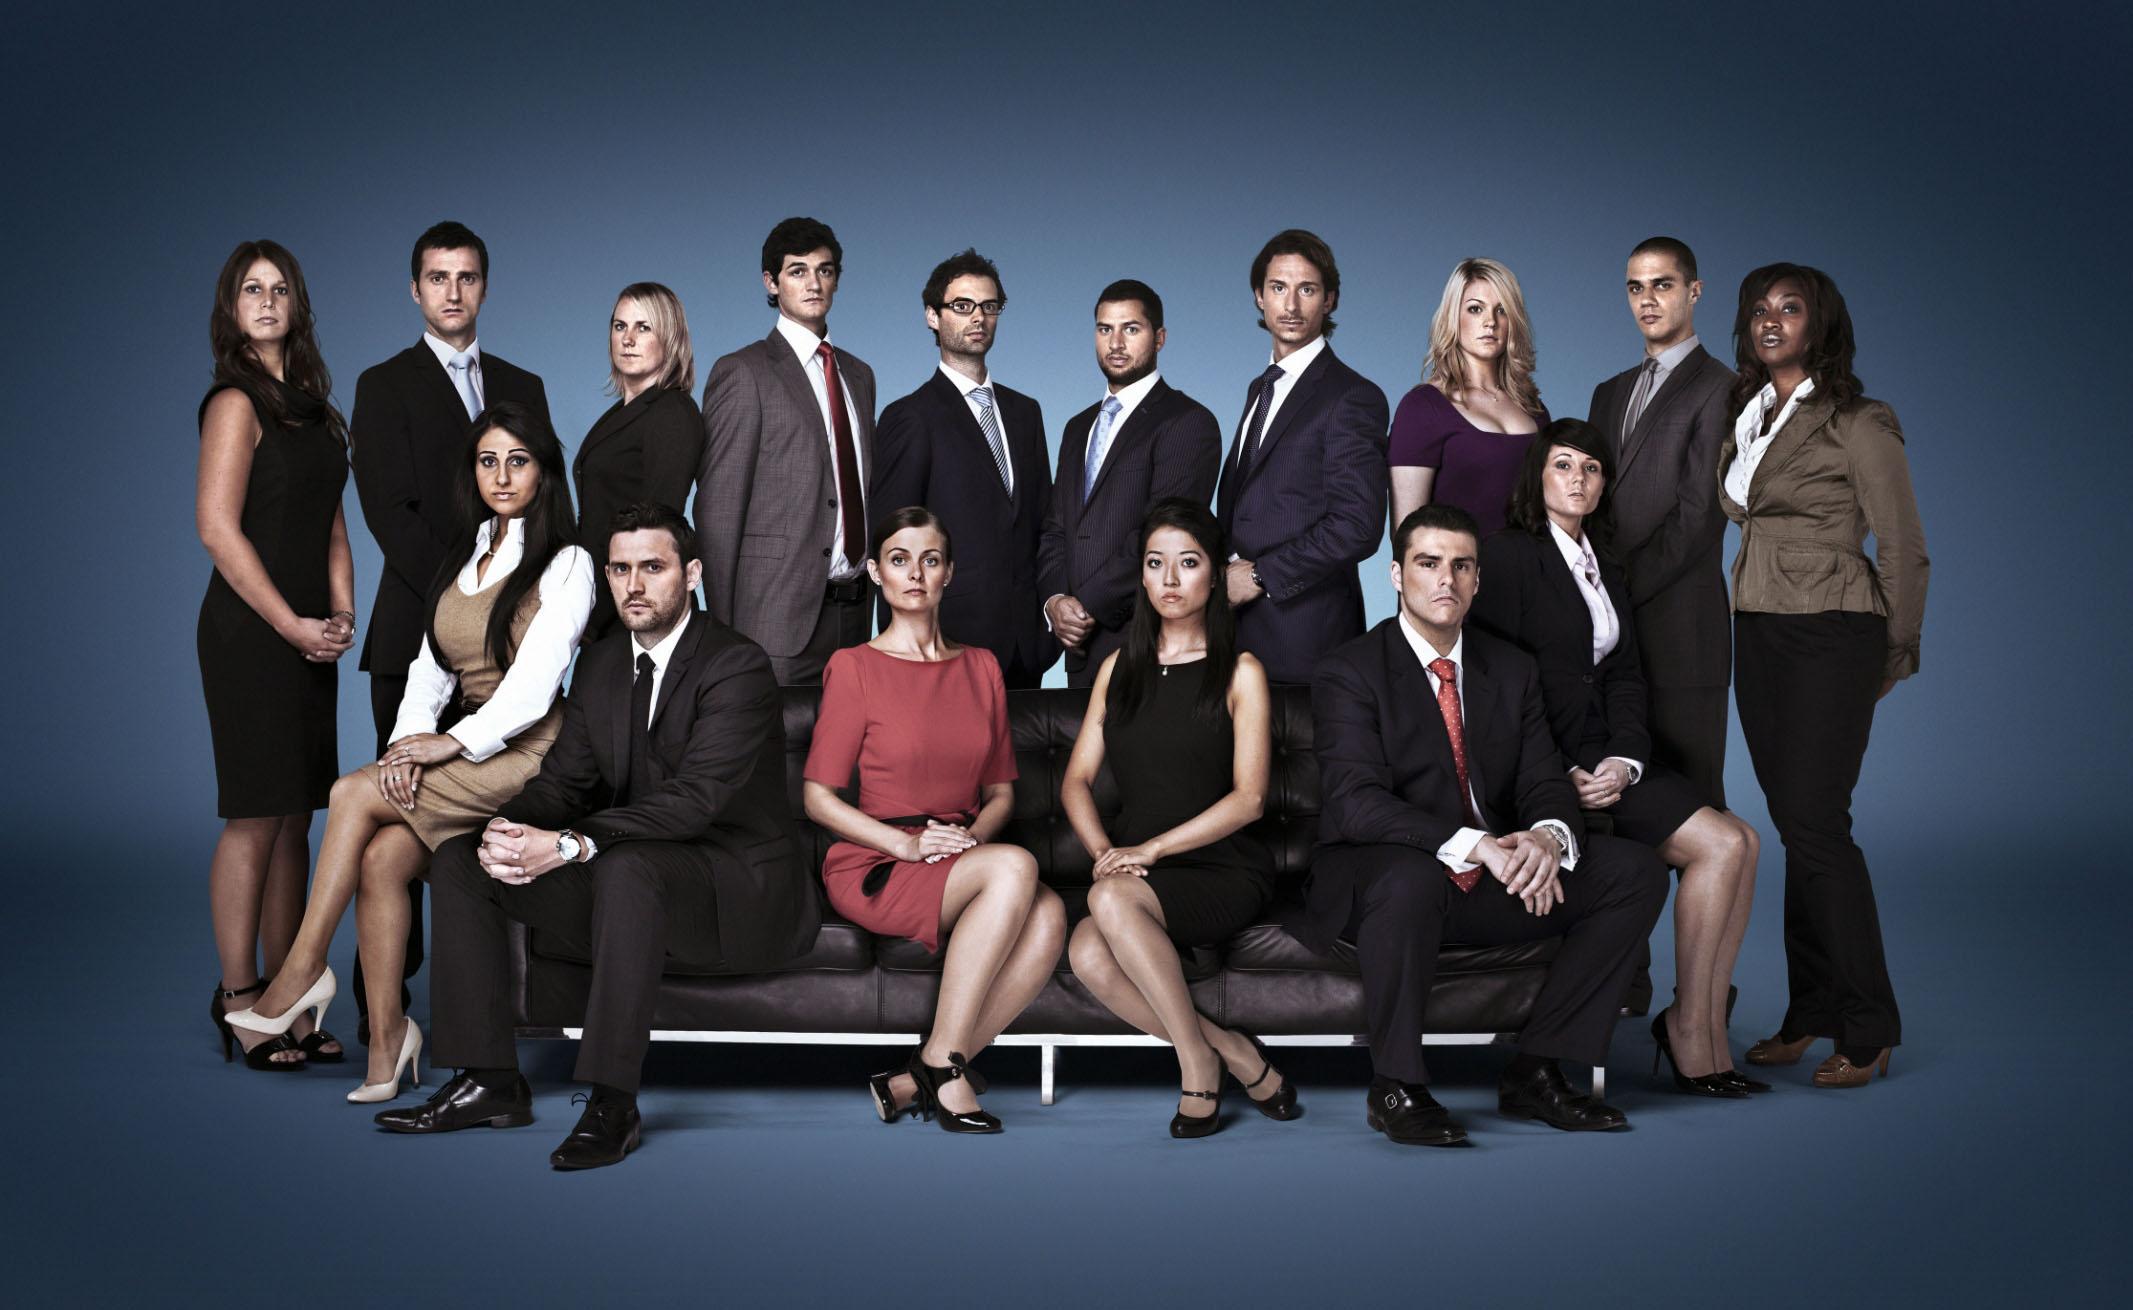 The Apprentice 2011: Meet the boys